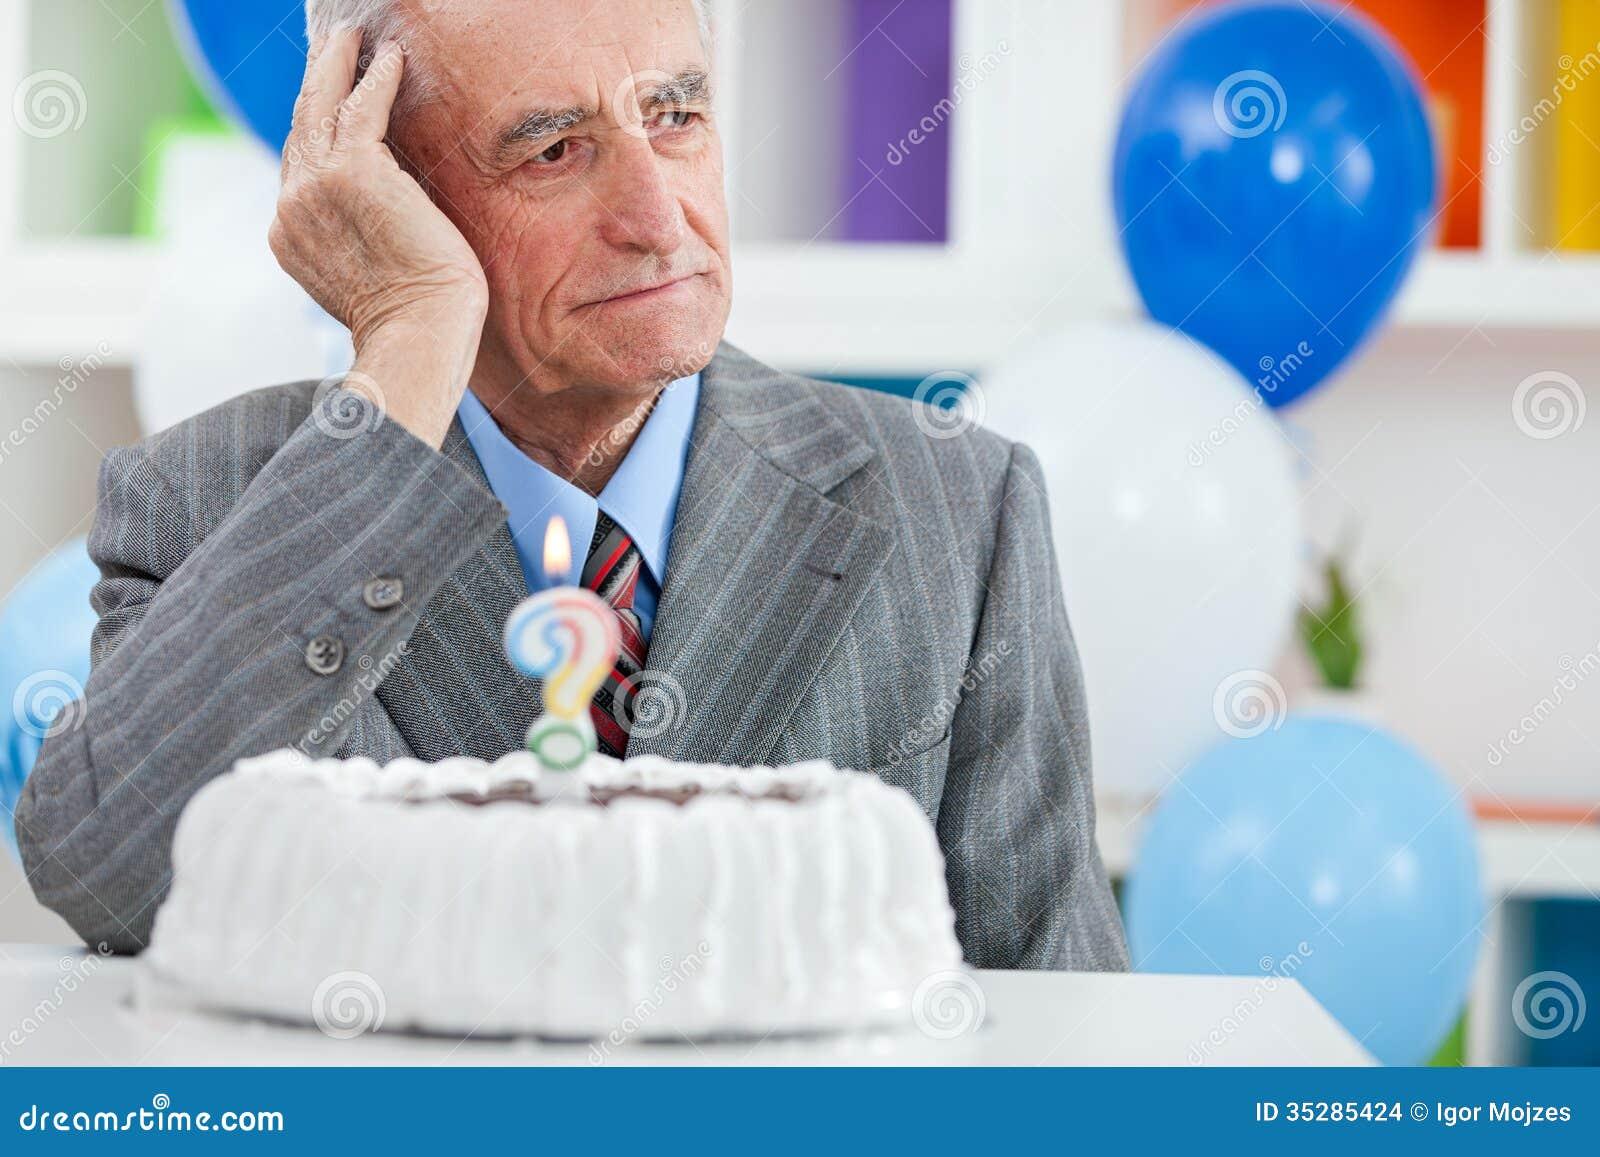 Старший человек забыл как старый